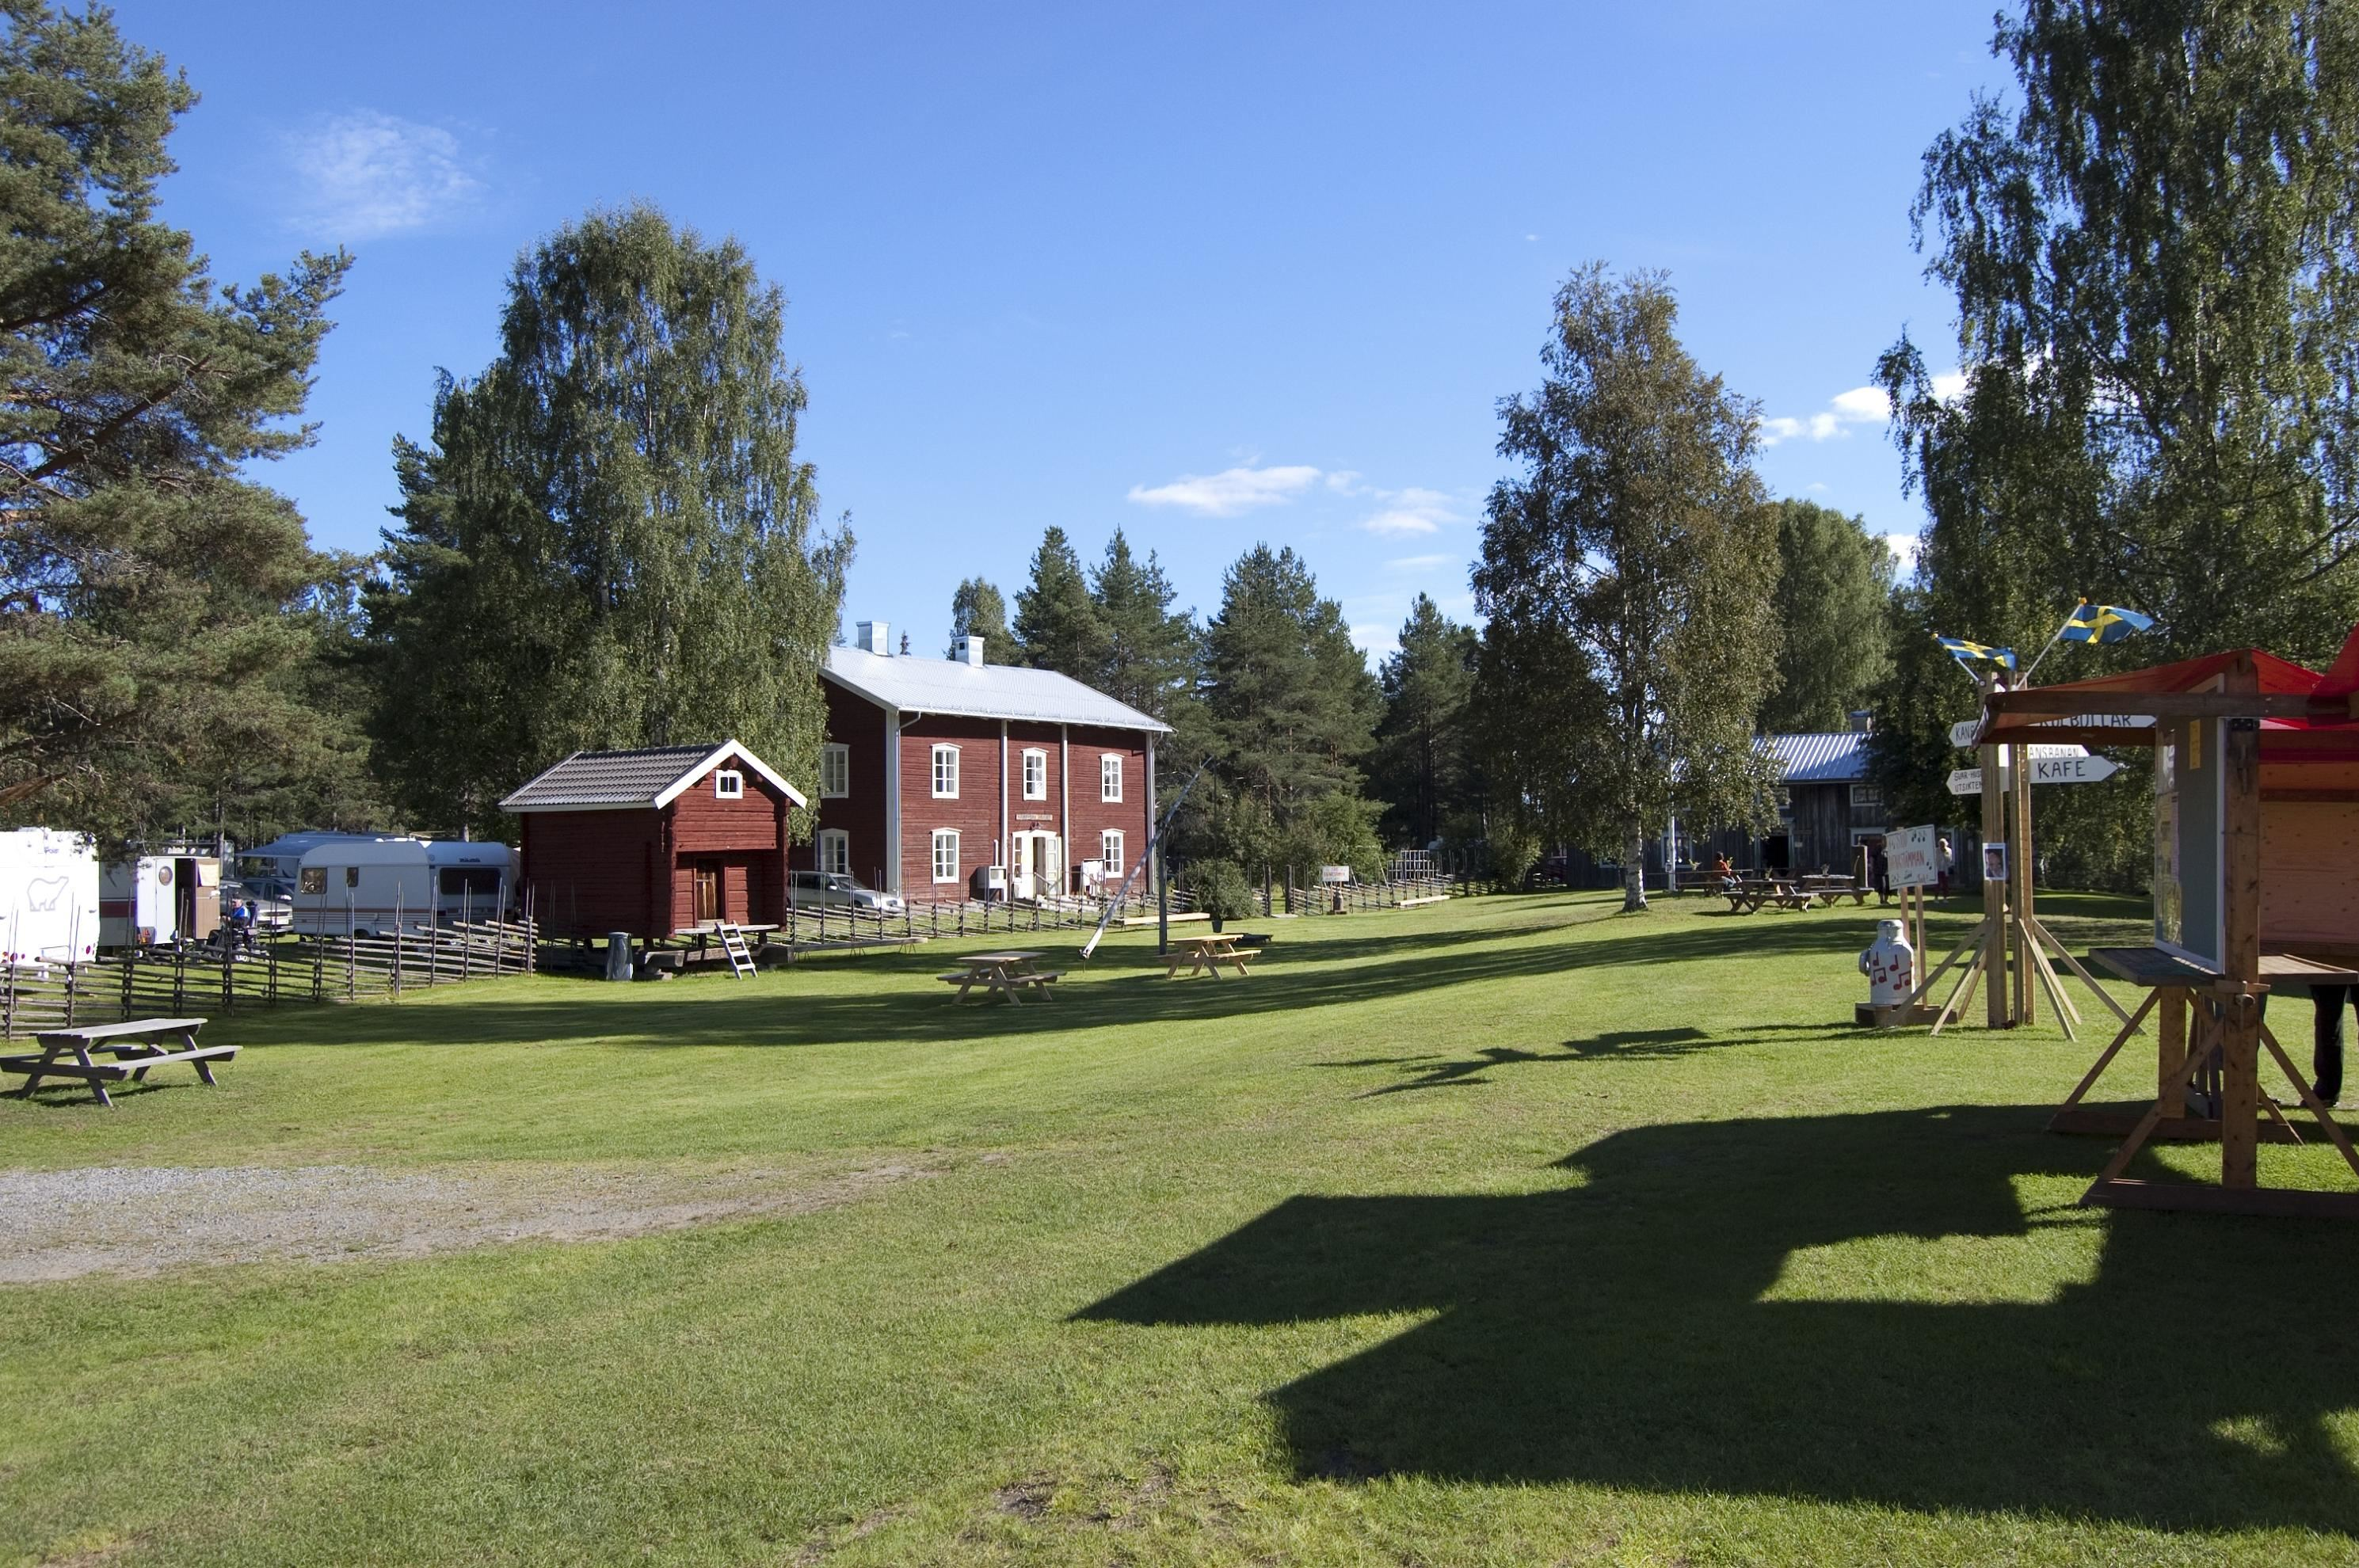 Ramsele Hembygdsgård